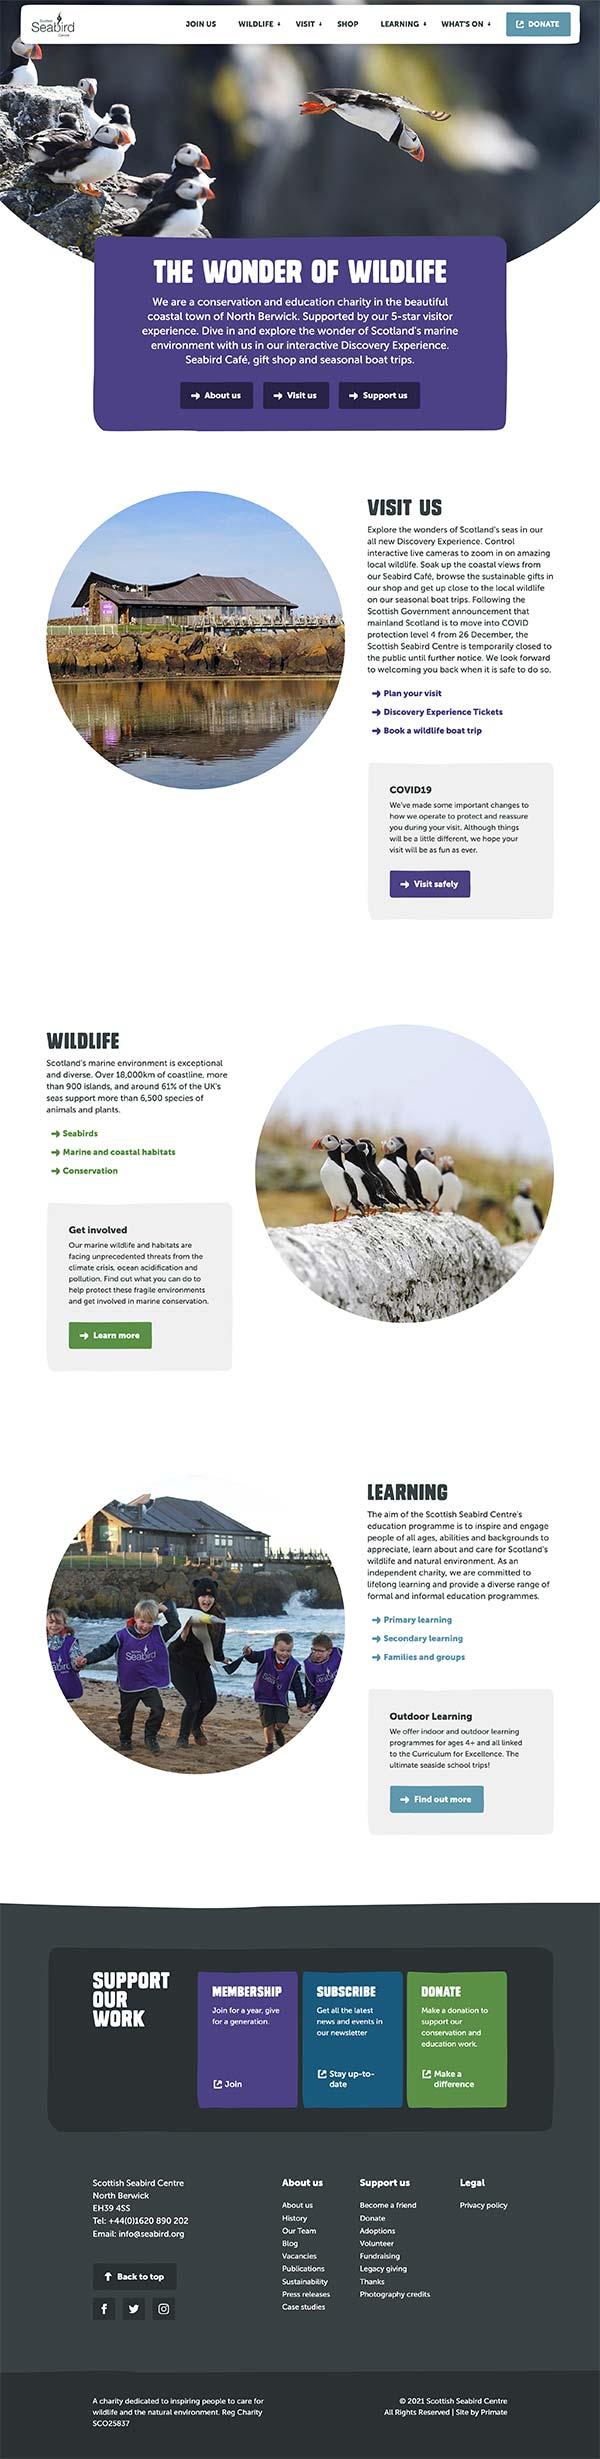 Scottish Seabird Centre homepage